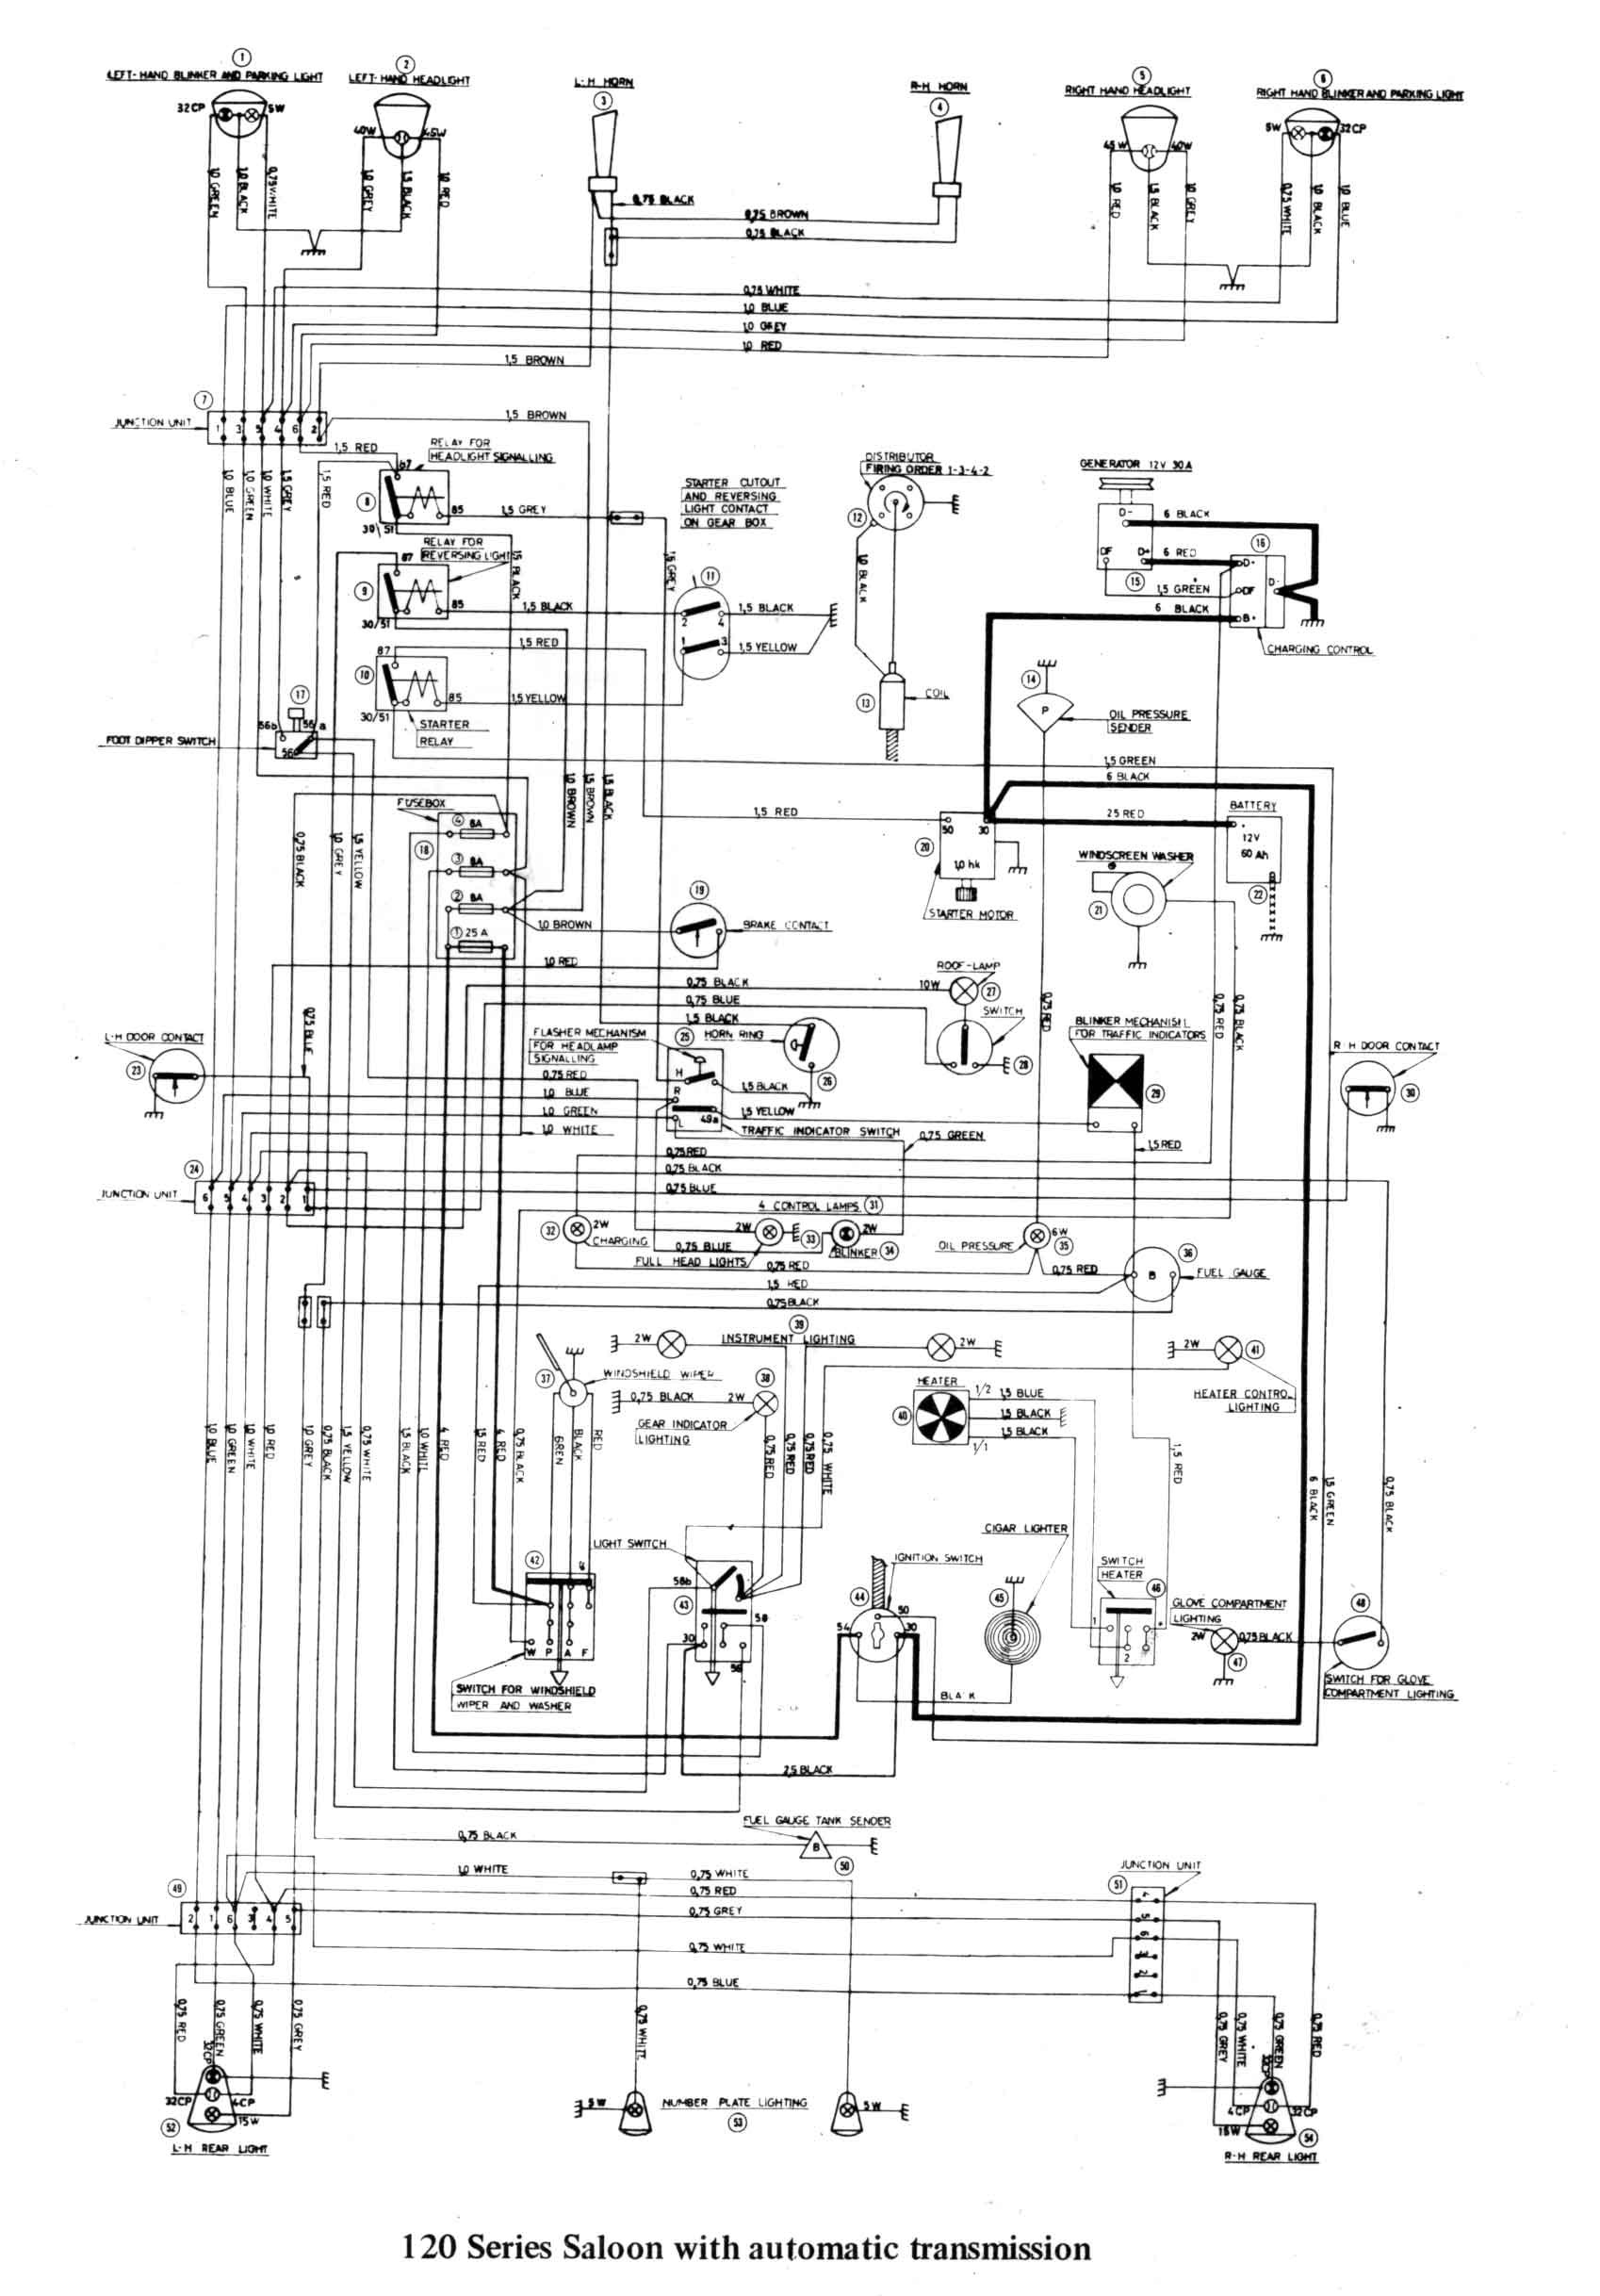 Automatic Transmission Diagram Sw Em Od Retrofitting On A Vintage Volvo Of Automatic Transmission Diagram